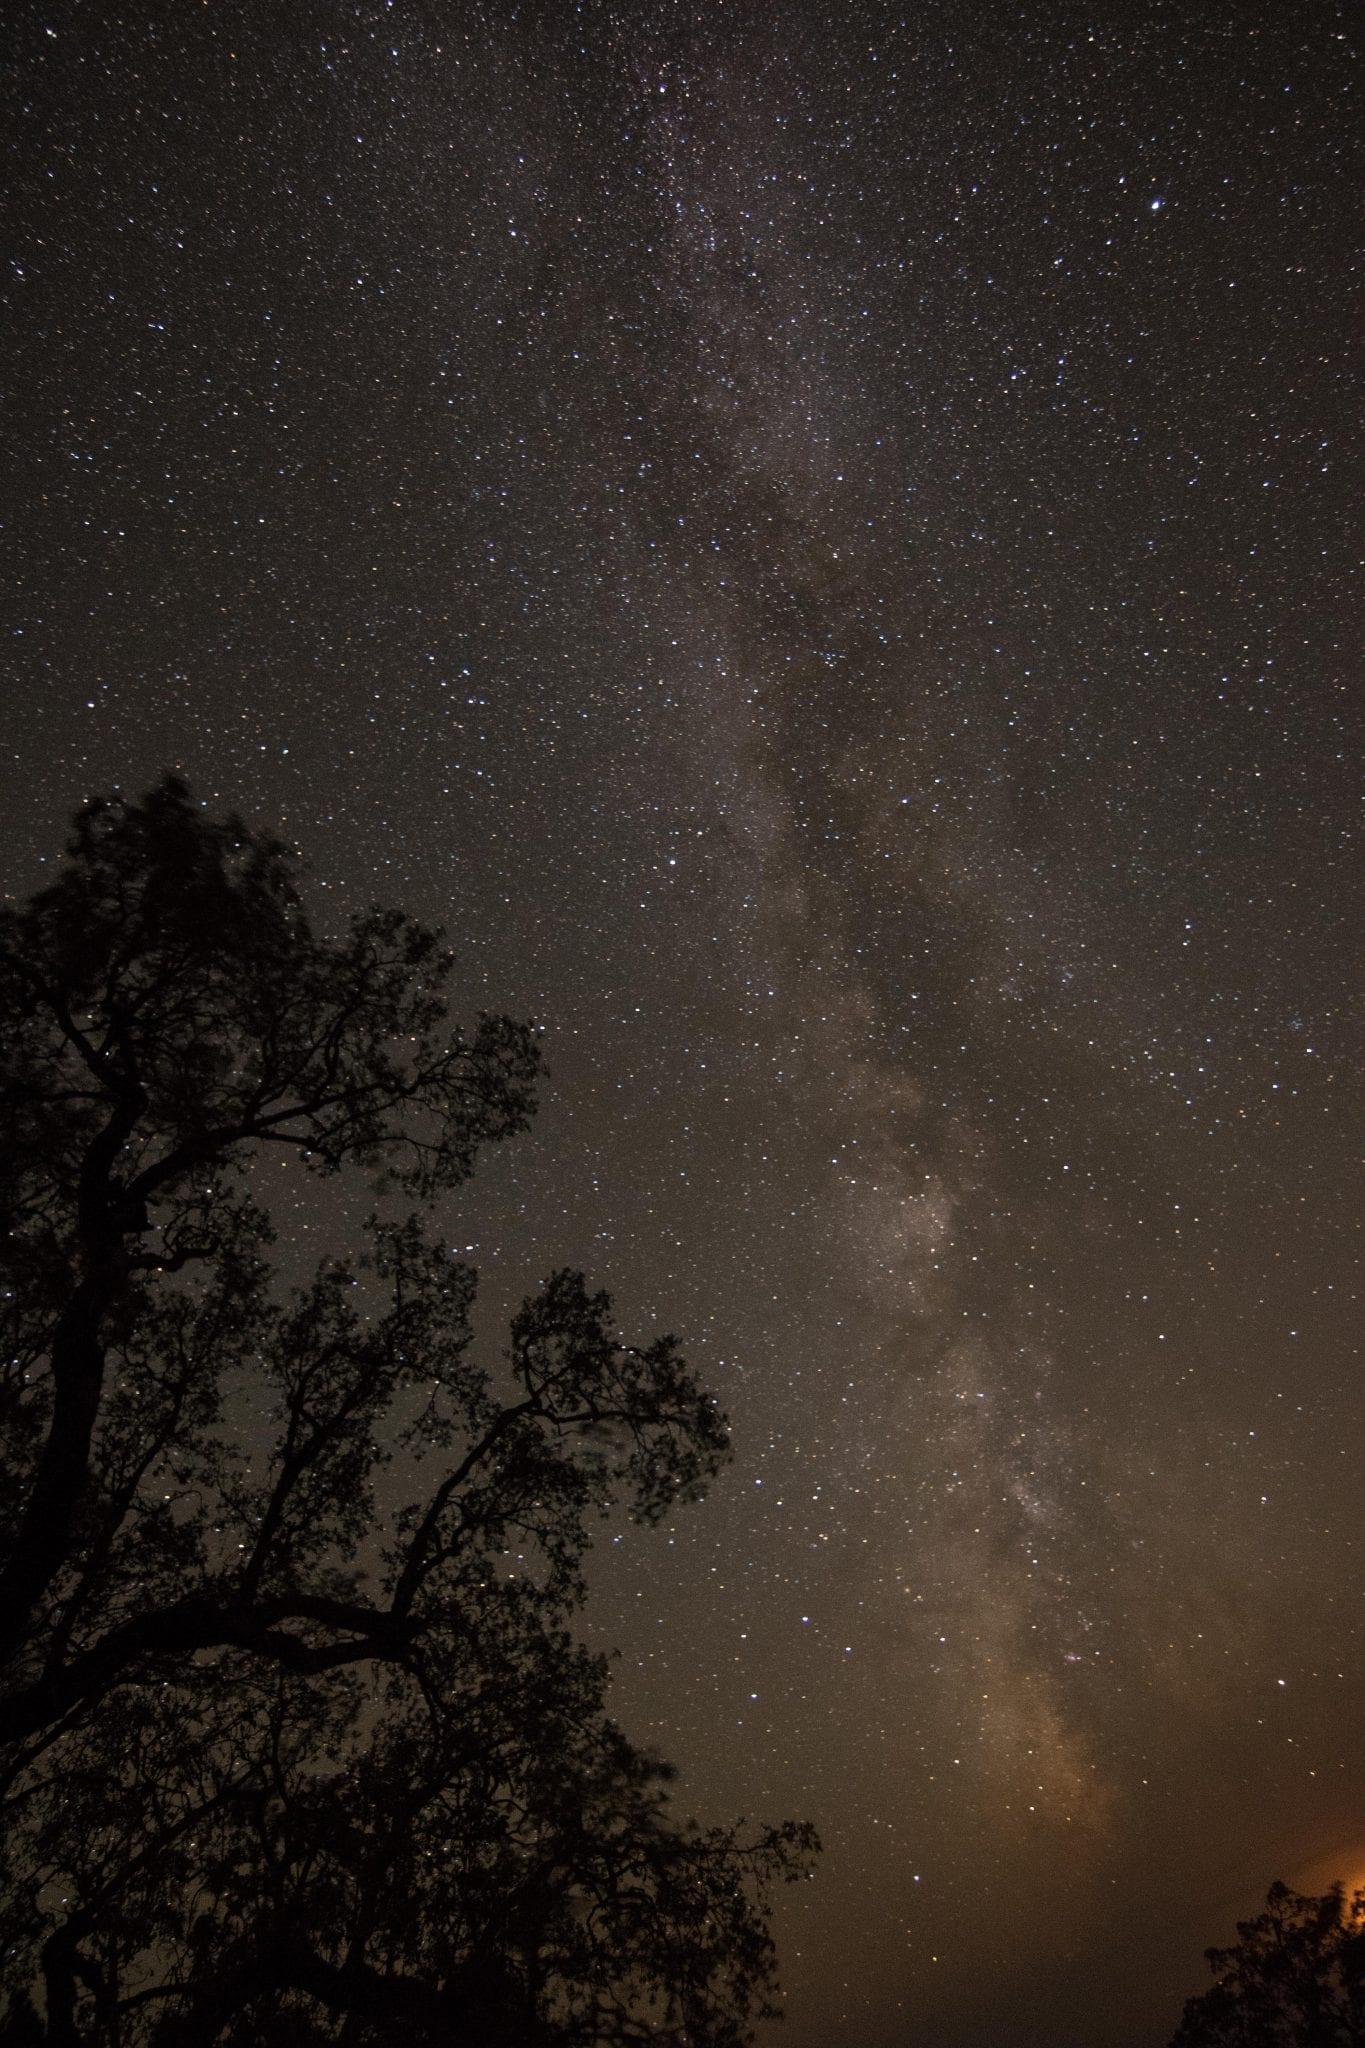 Milky Way milky way live oak stars starry night sky